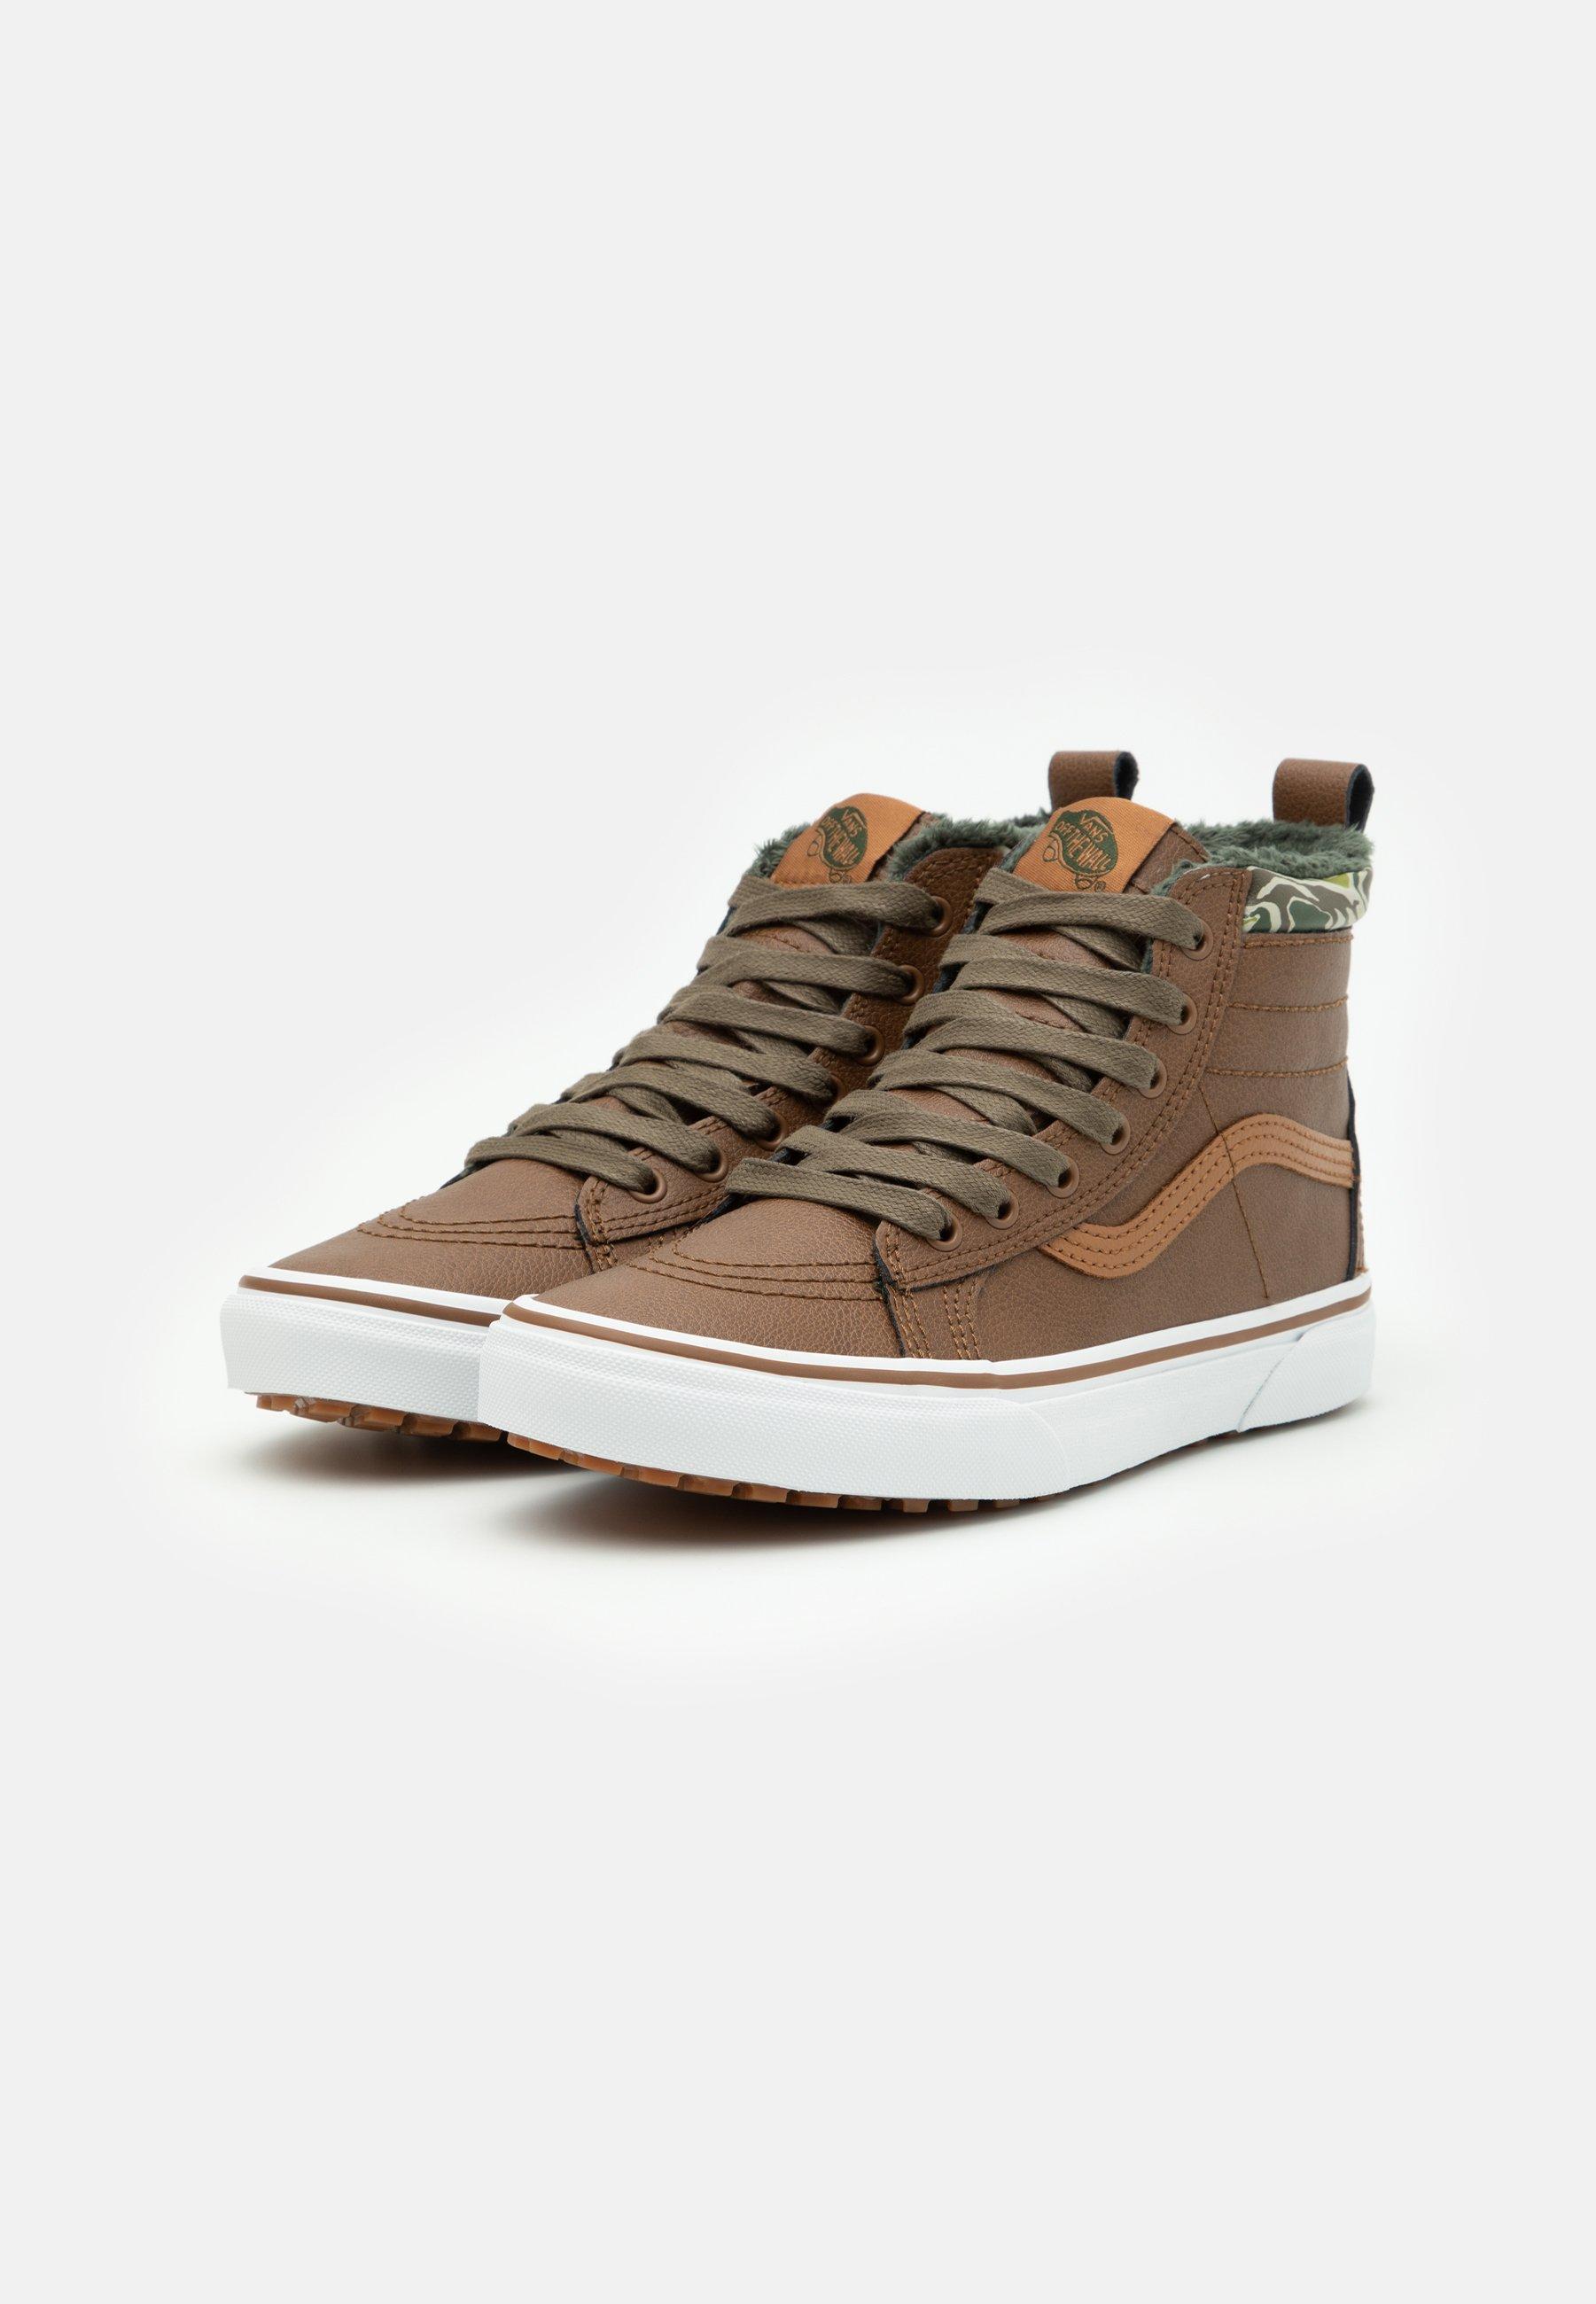 Vans SK8 MTE UNISEX - Sneakers alte - dachshund/sabbia - Zalando.it